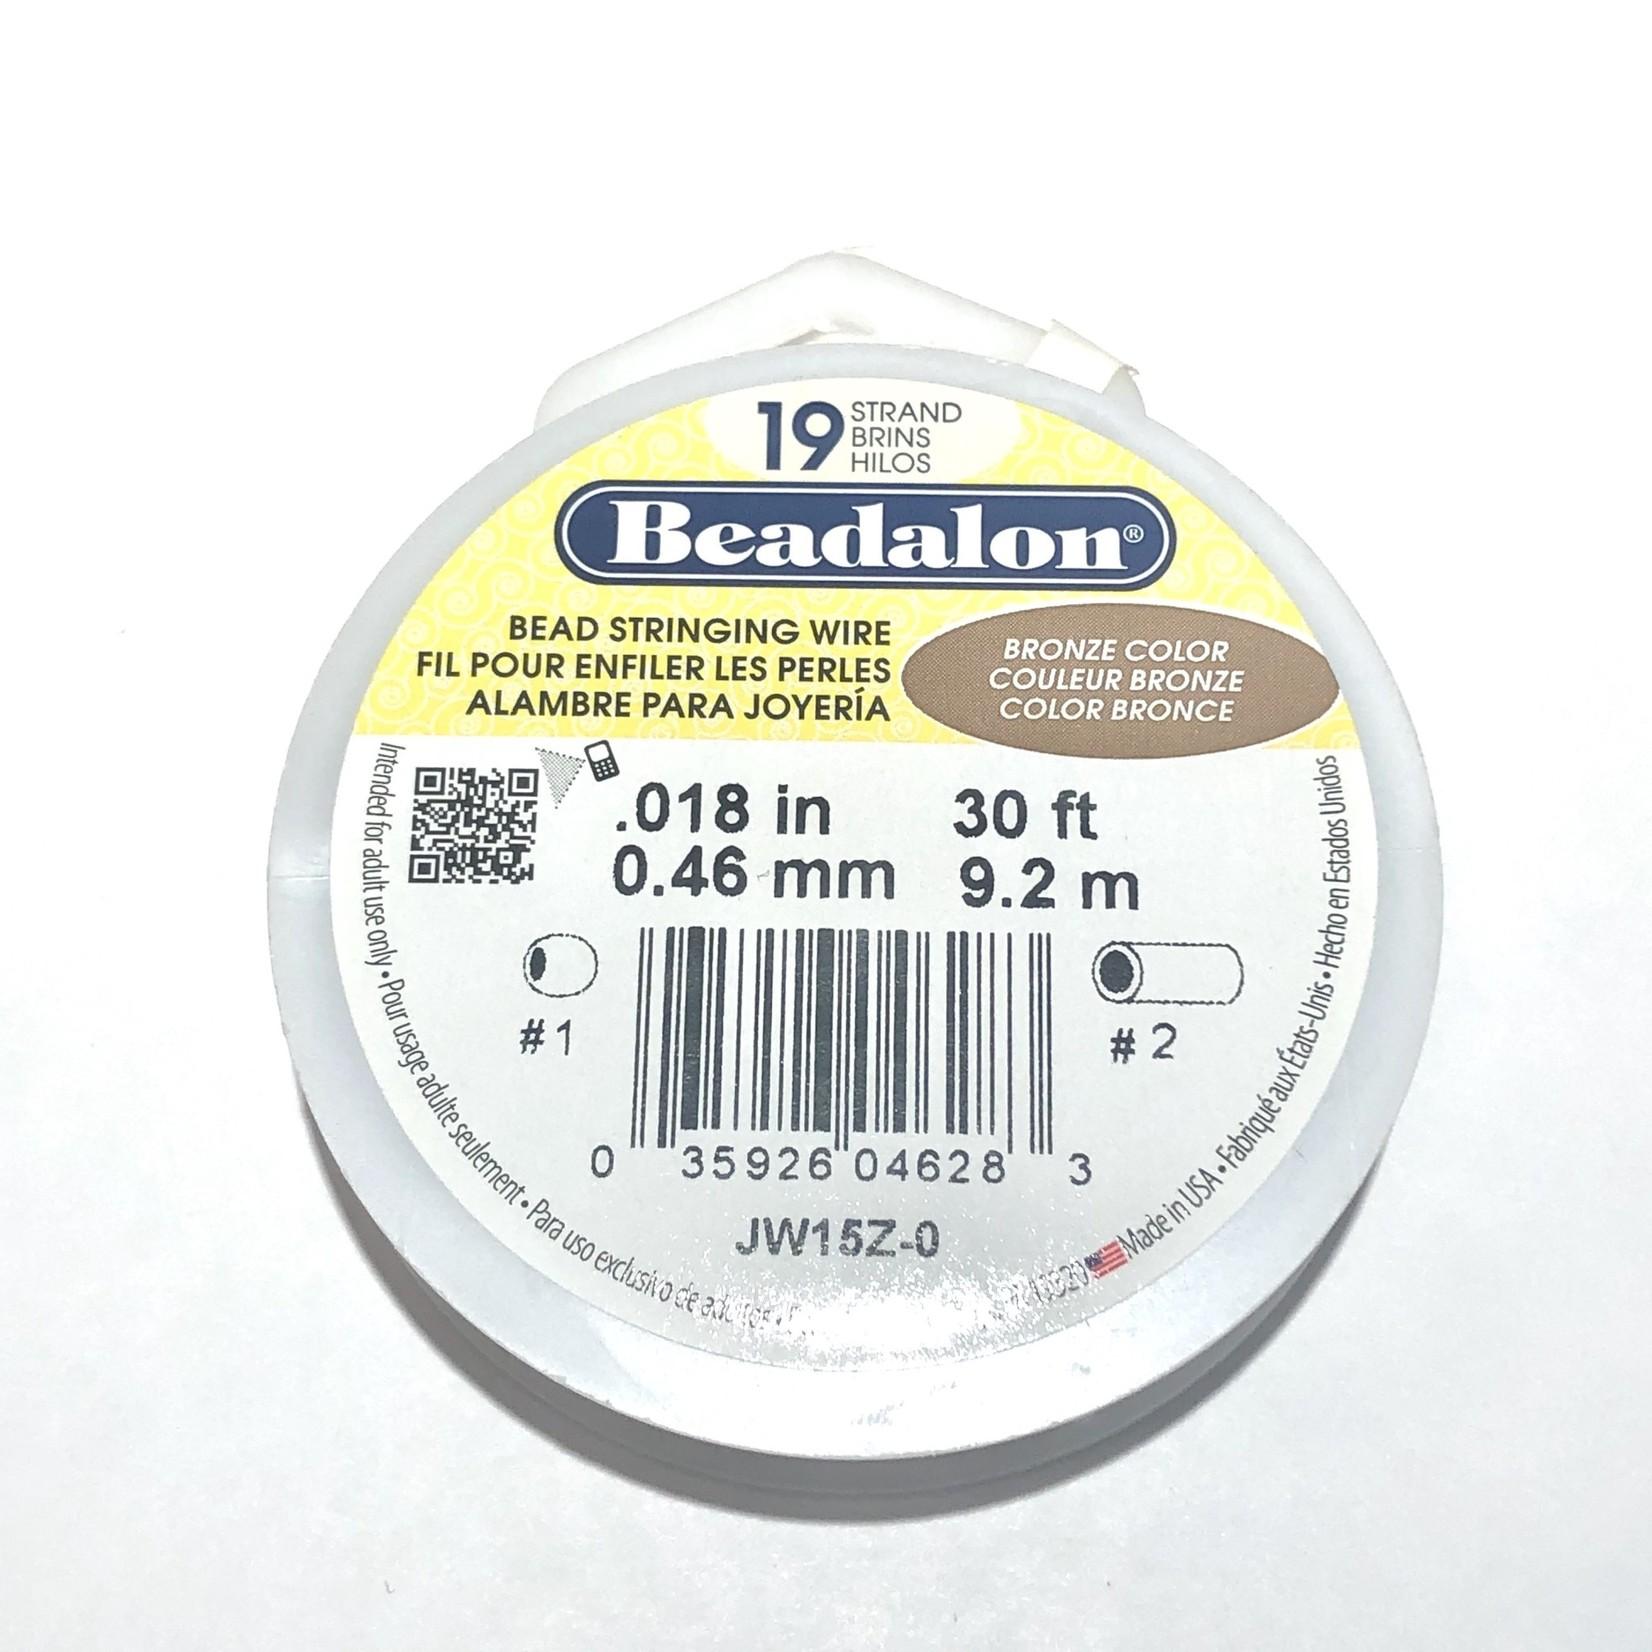 "Beadalon BEADALON Bead Wire 19 Str .018"" Bronze 30'"